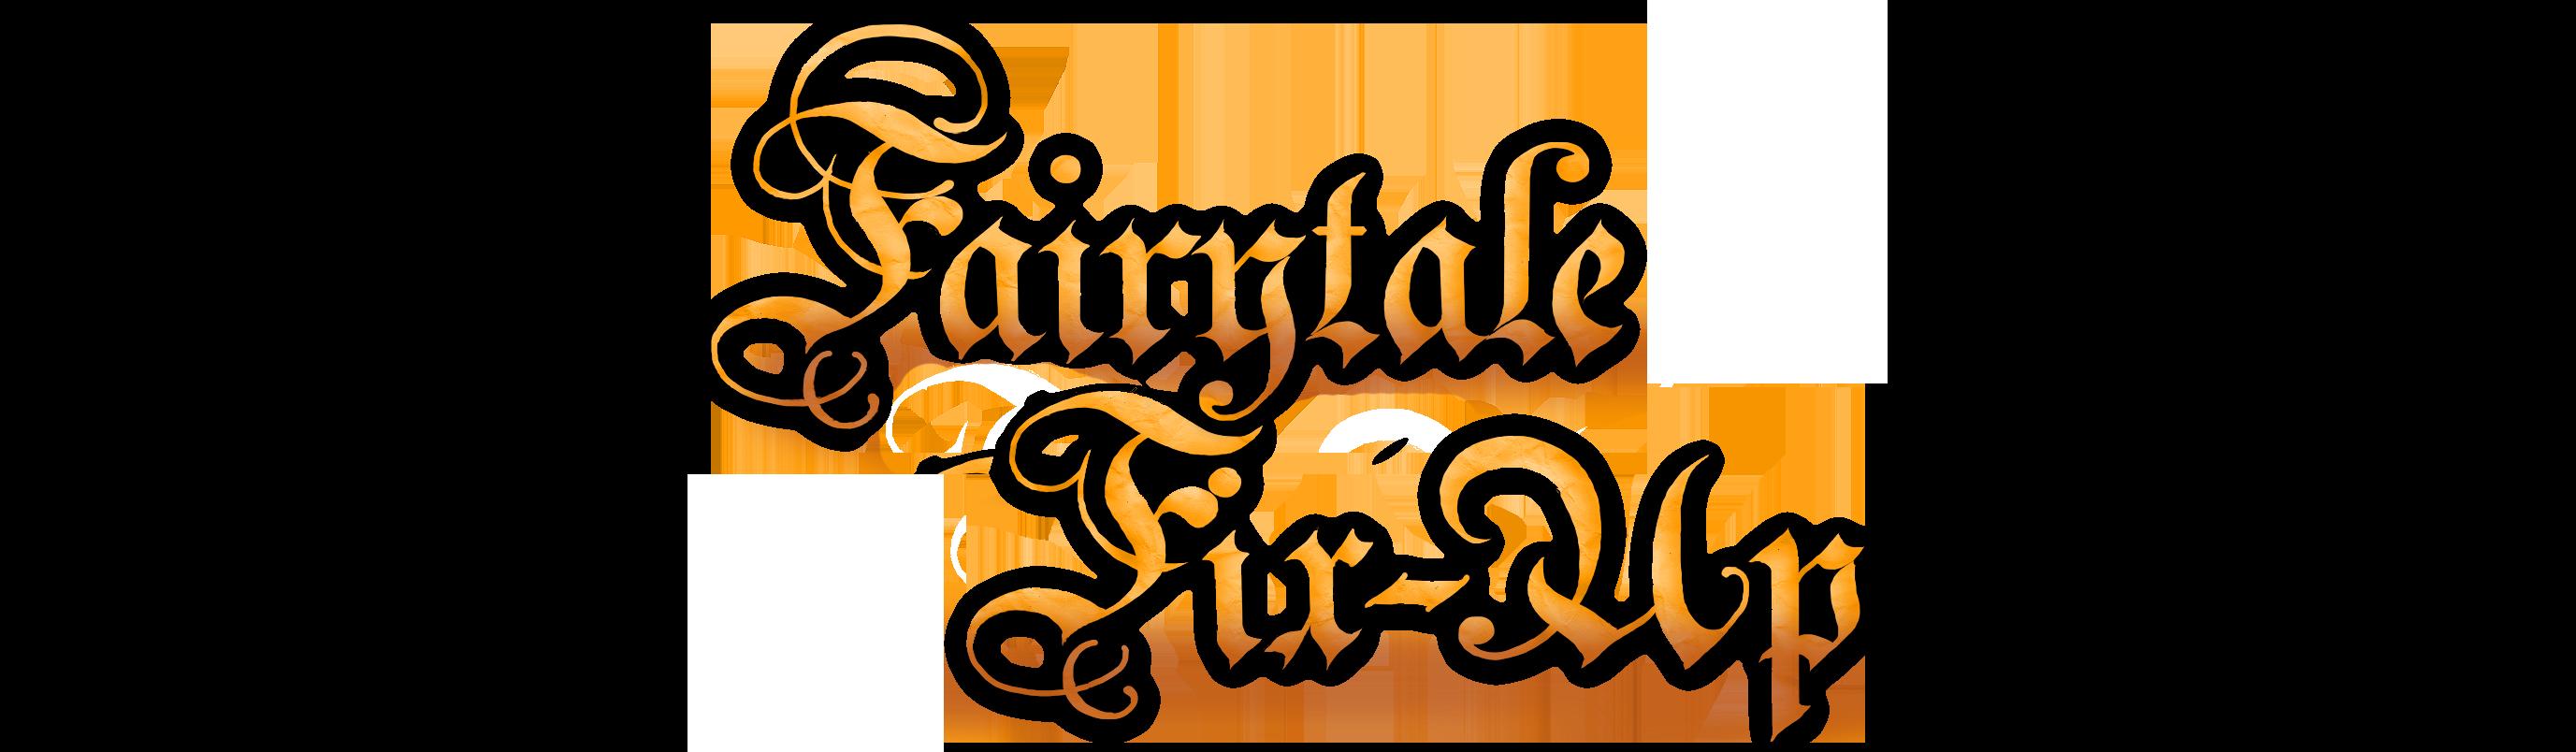 Fairytale Fix-Up